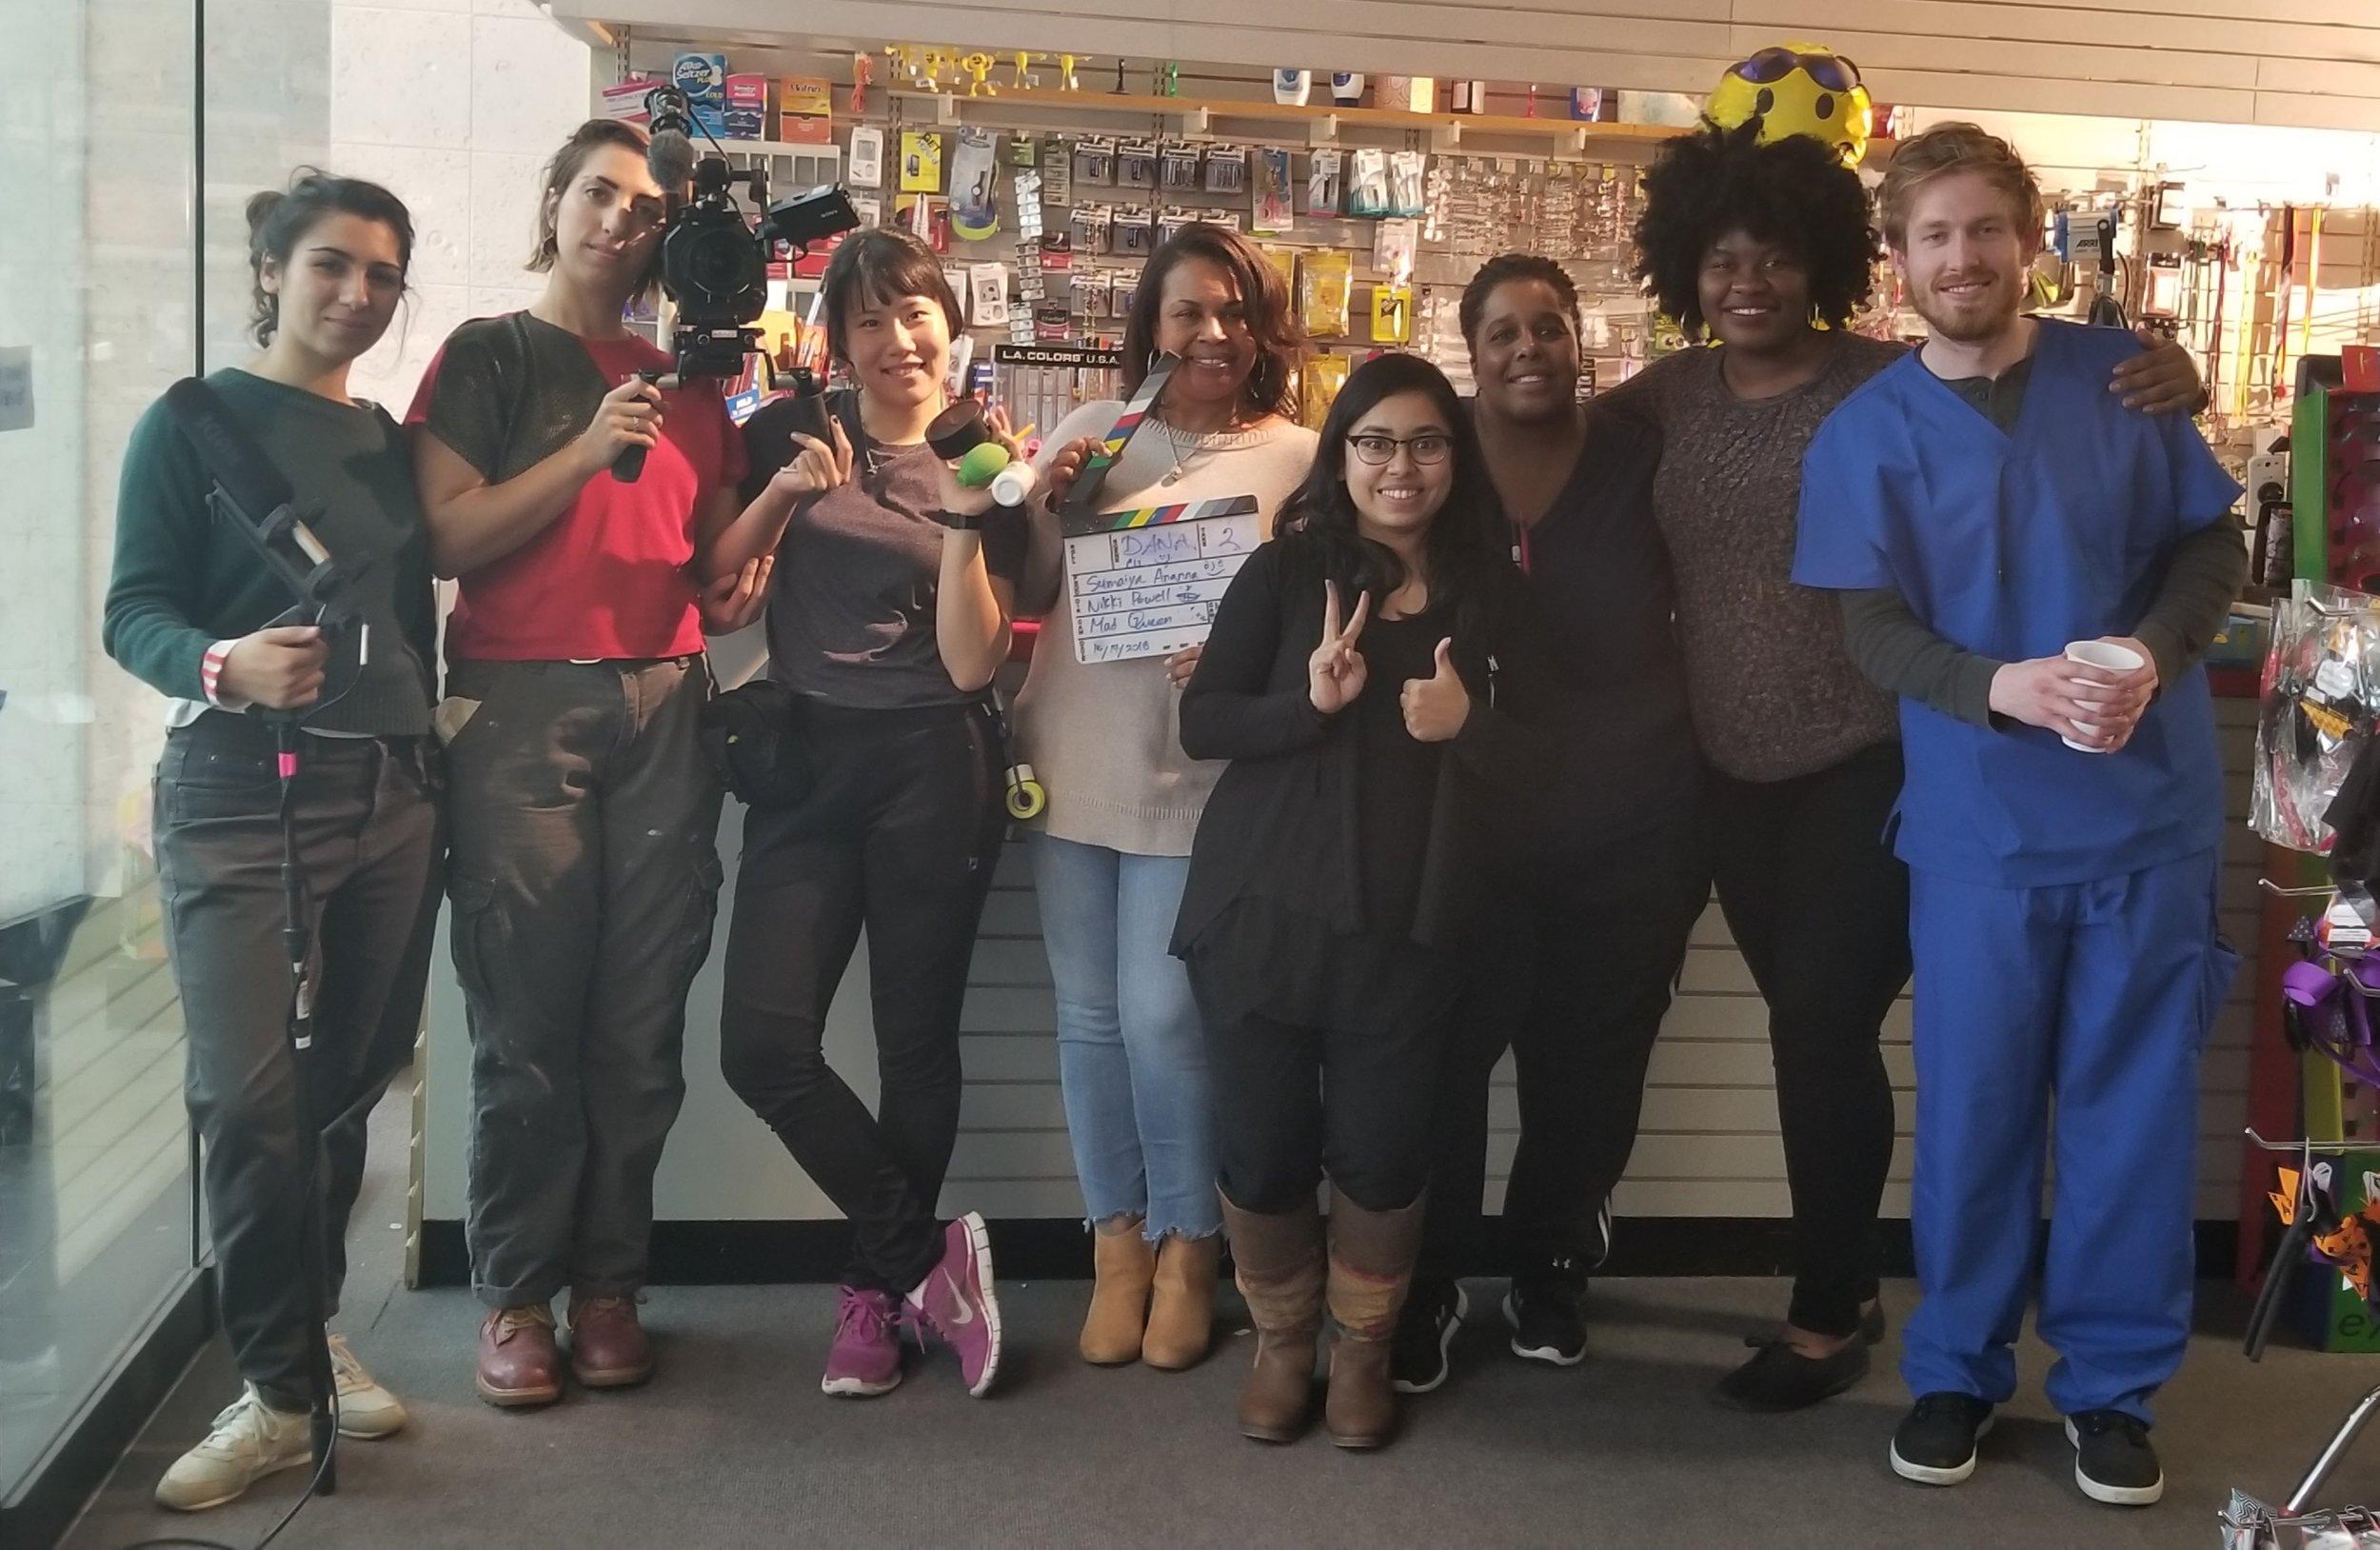 Cast and Crew from Inconvenient Encounter - Emily Kofsky, Maddie Becker, Minji Kim, Dana Scott, Sumaiya Ananna, Nicole Powell, A'Shonte Jones, and Jonathan J. Ryan